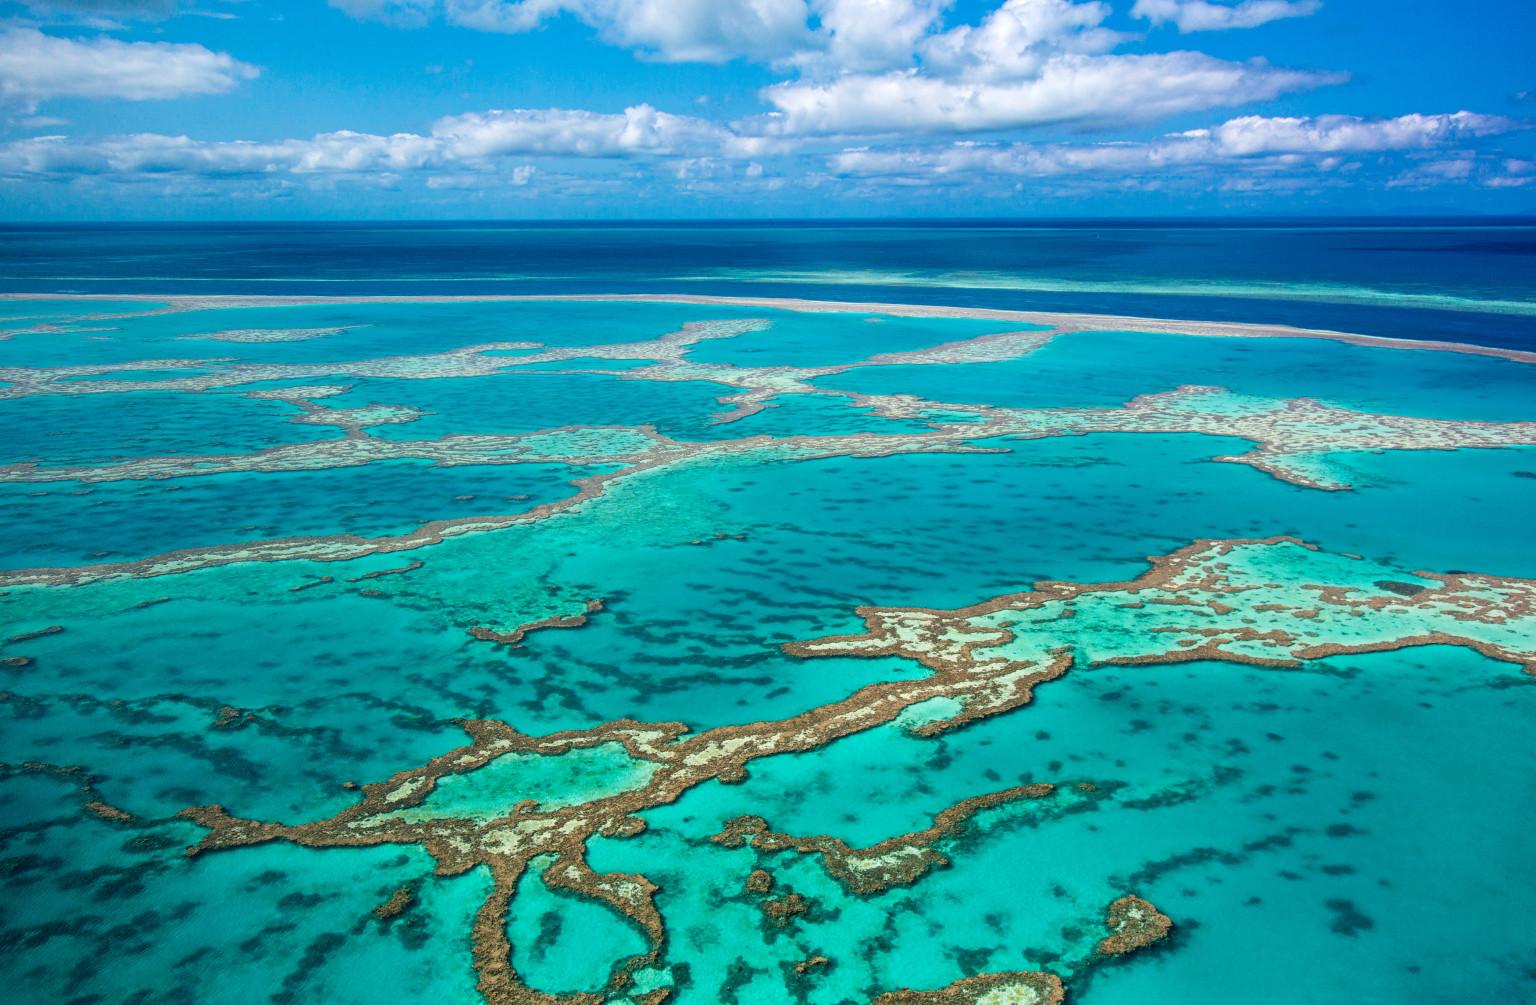 Travel Australia To New Zealand By Boat